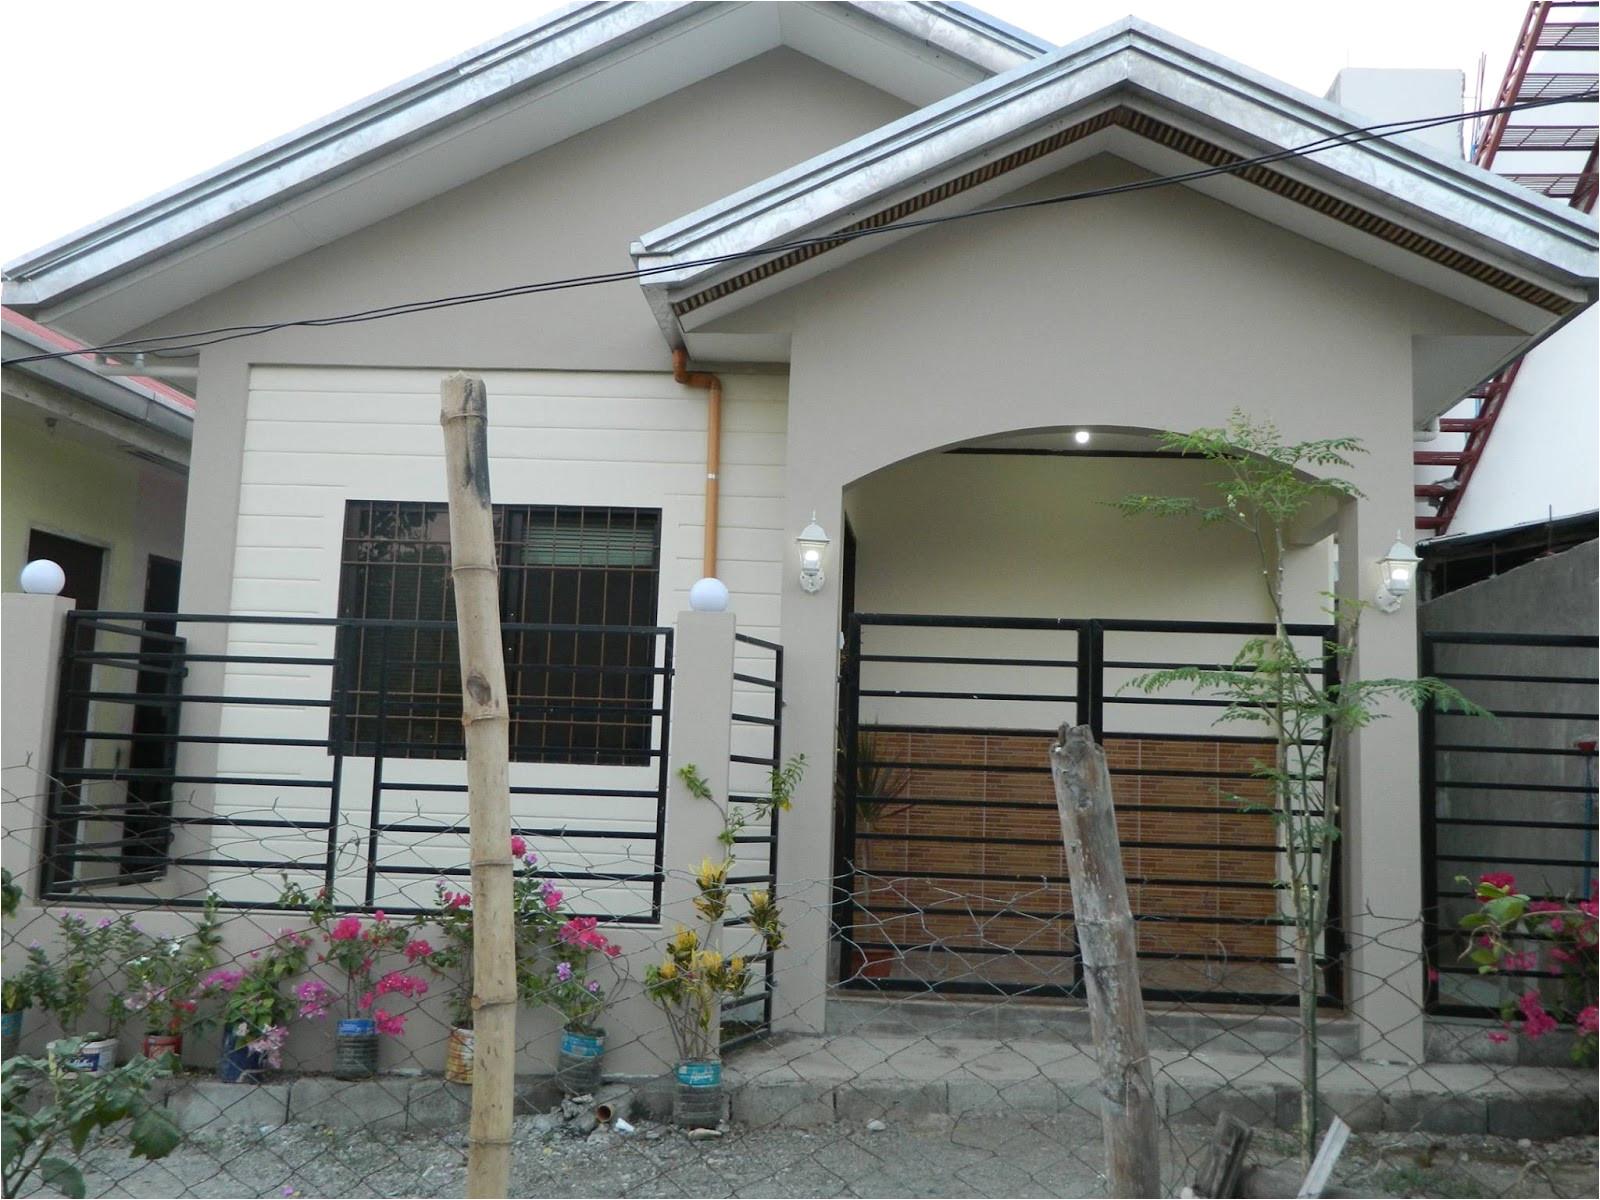 house design worth 300 000 pesos